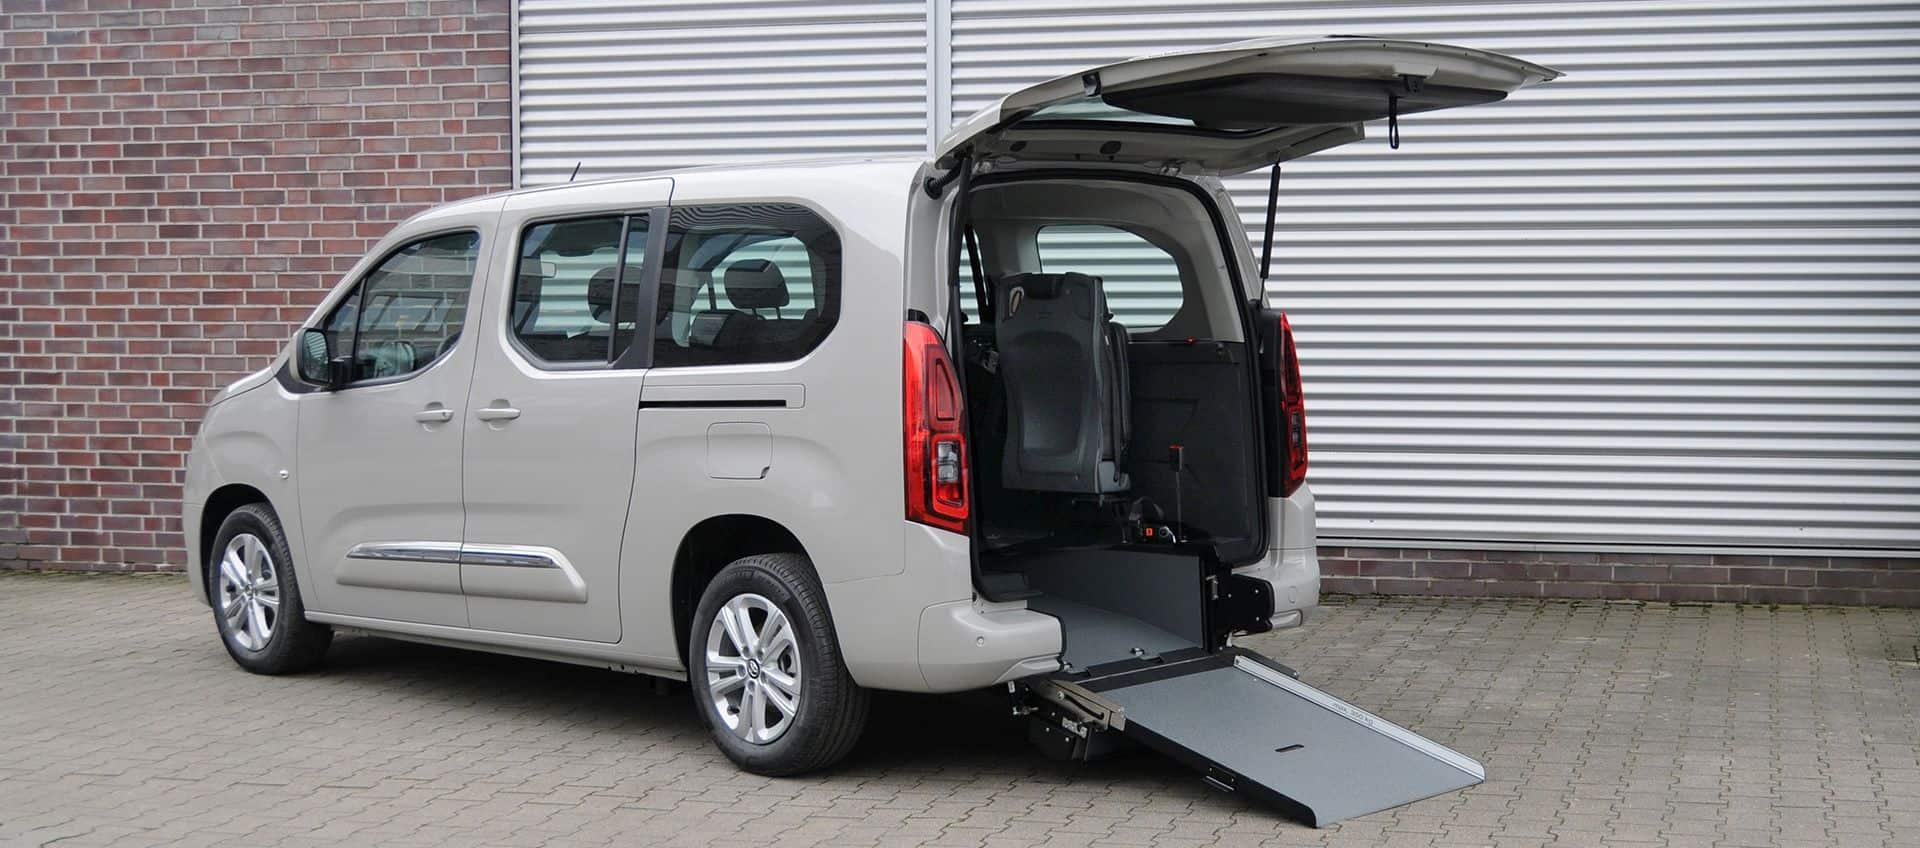 Behindertentransporter-Toyota-72dpi